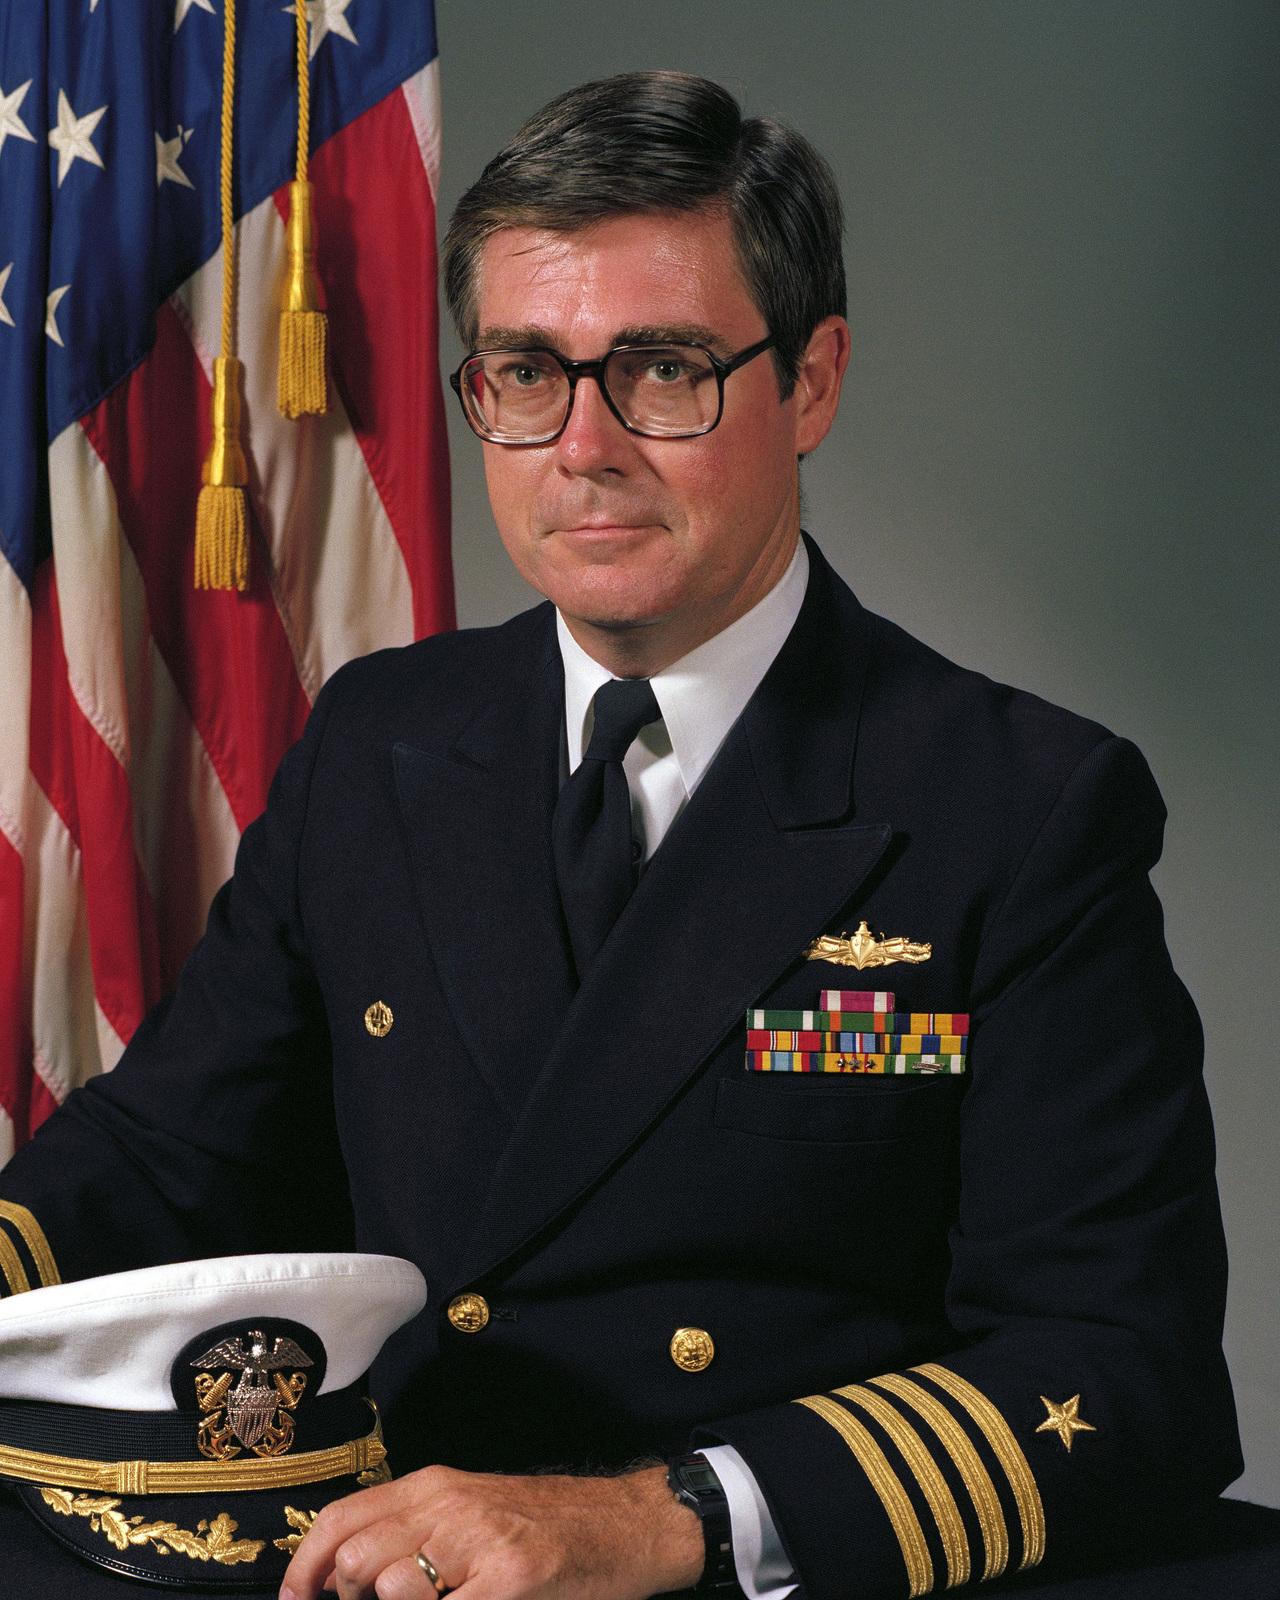 Captain Donald E. Nolan, USN (uncovered)